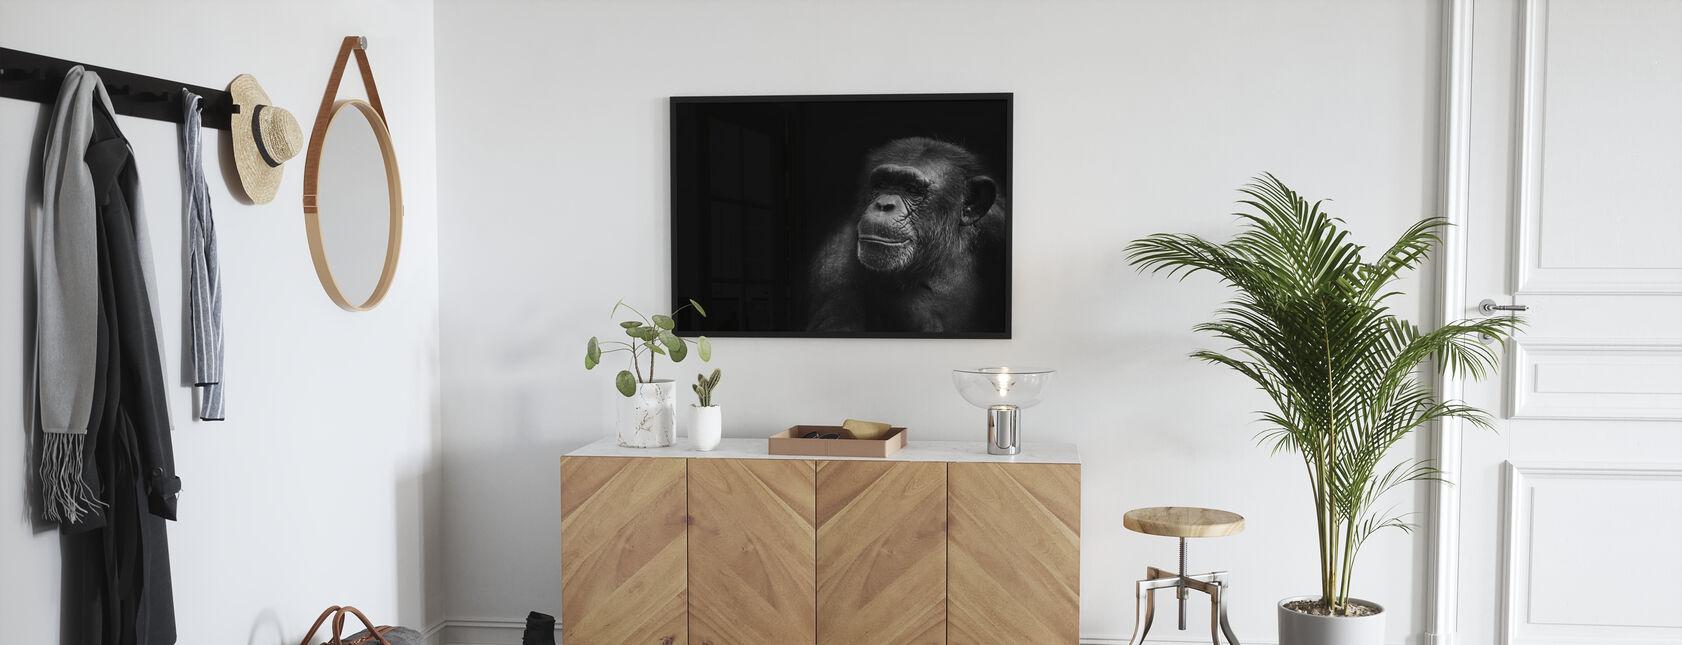 Monkey and Black - Poster - Hallway